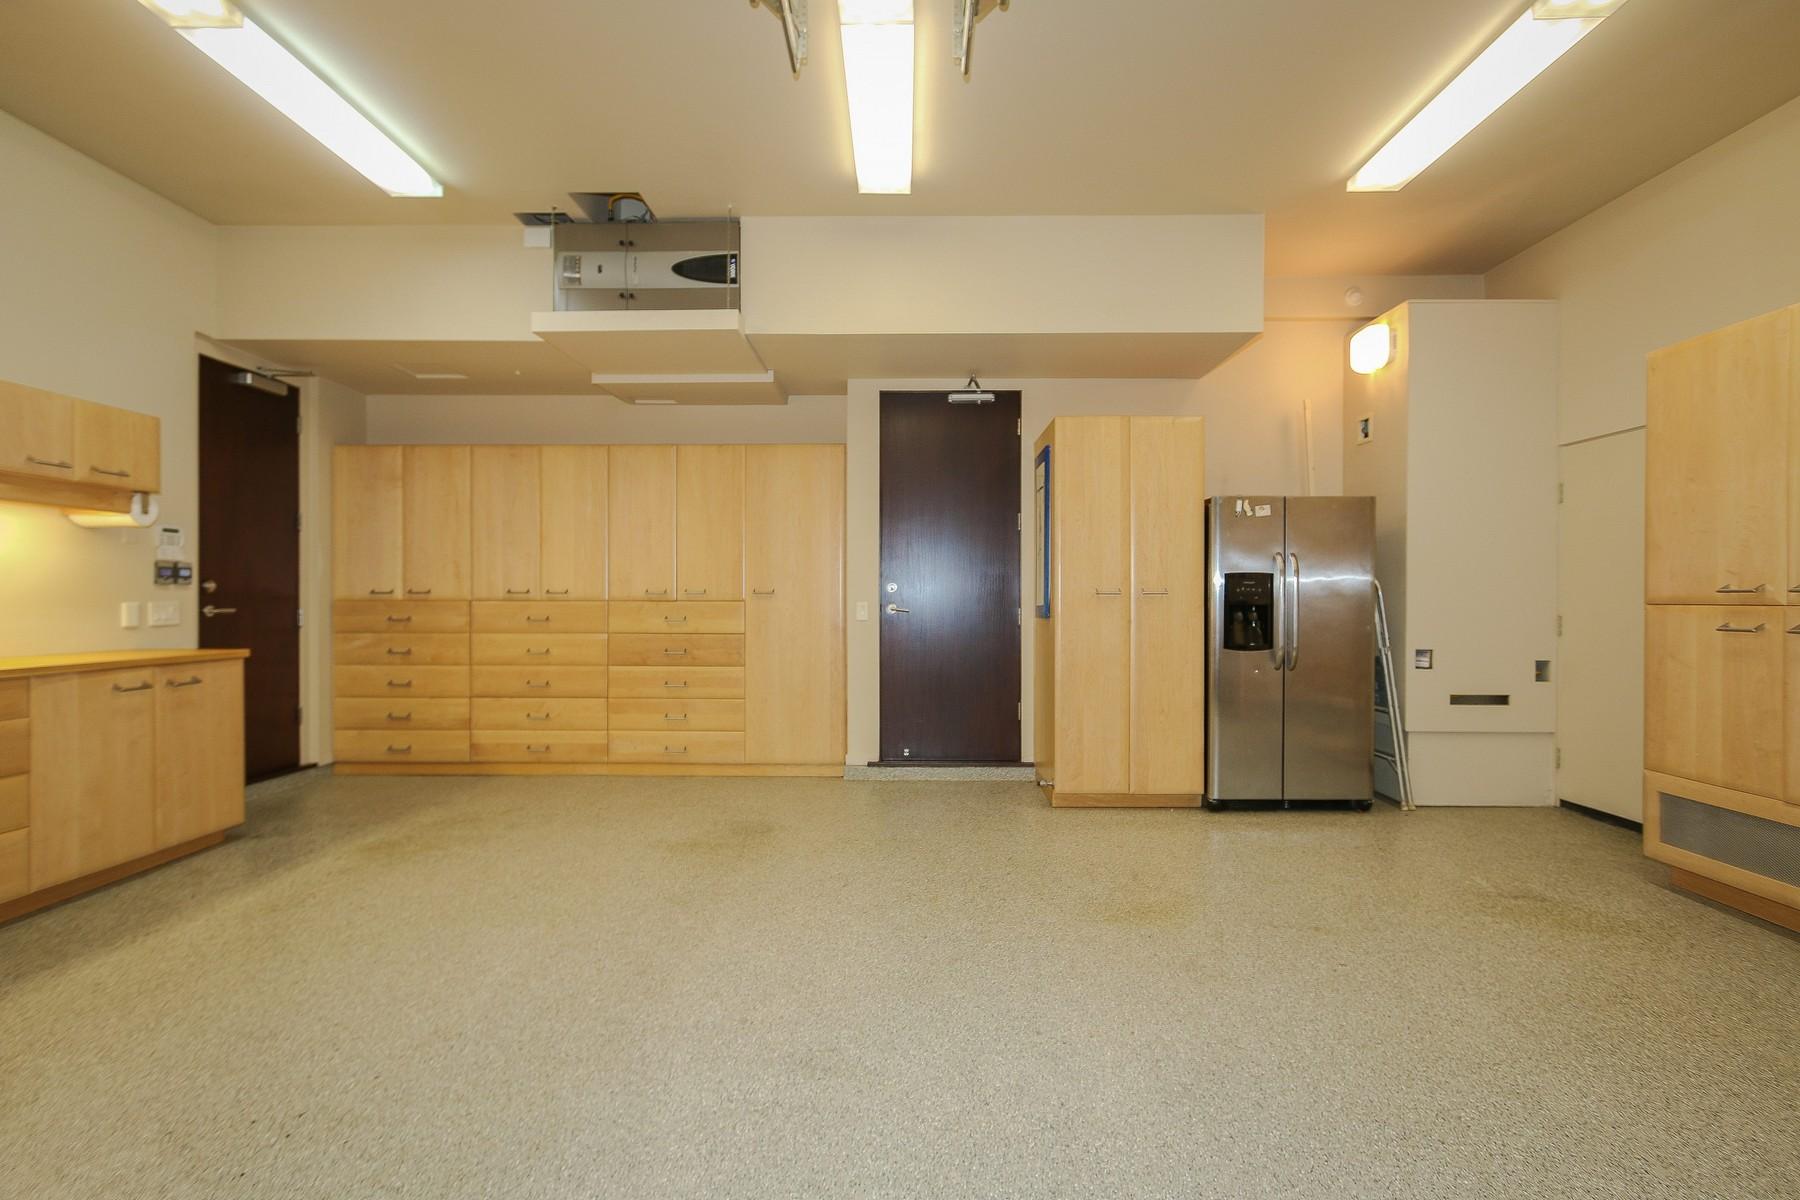 Additional photo for property listing at 5564 Calumet Avenue  La Jolla, California 92037 United States